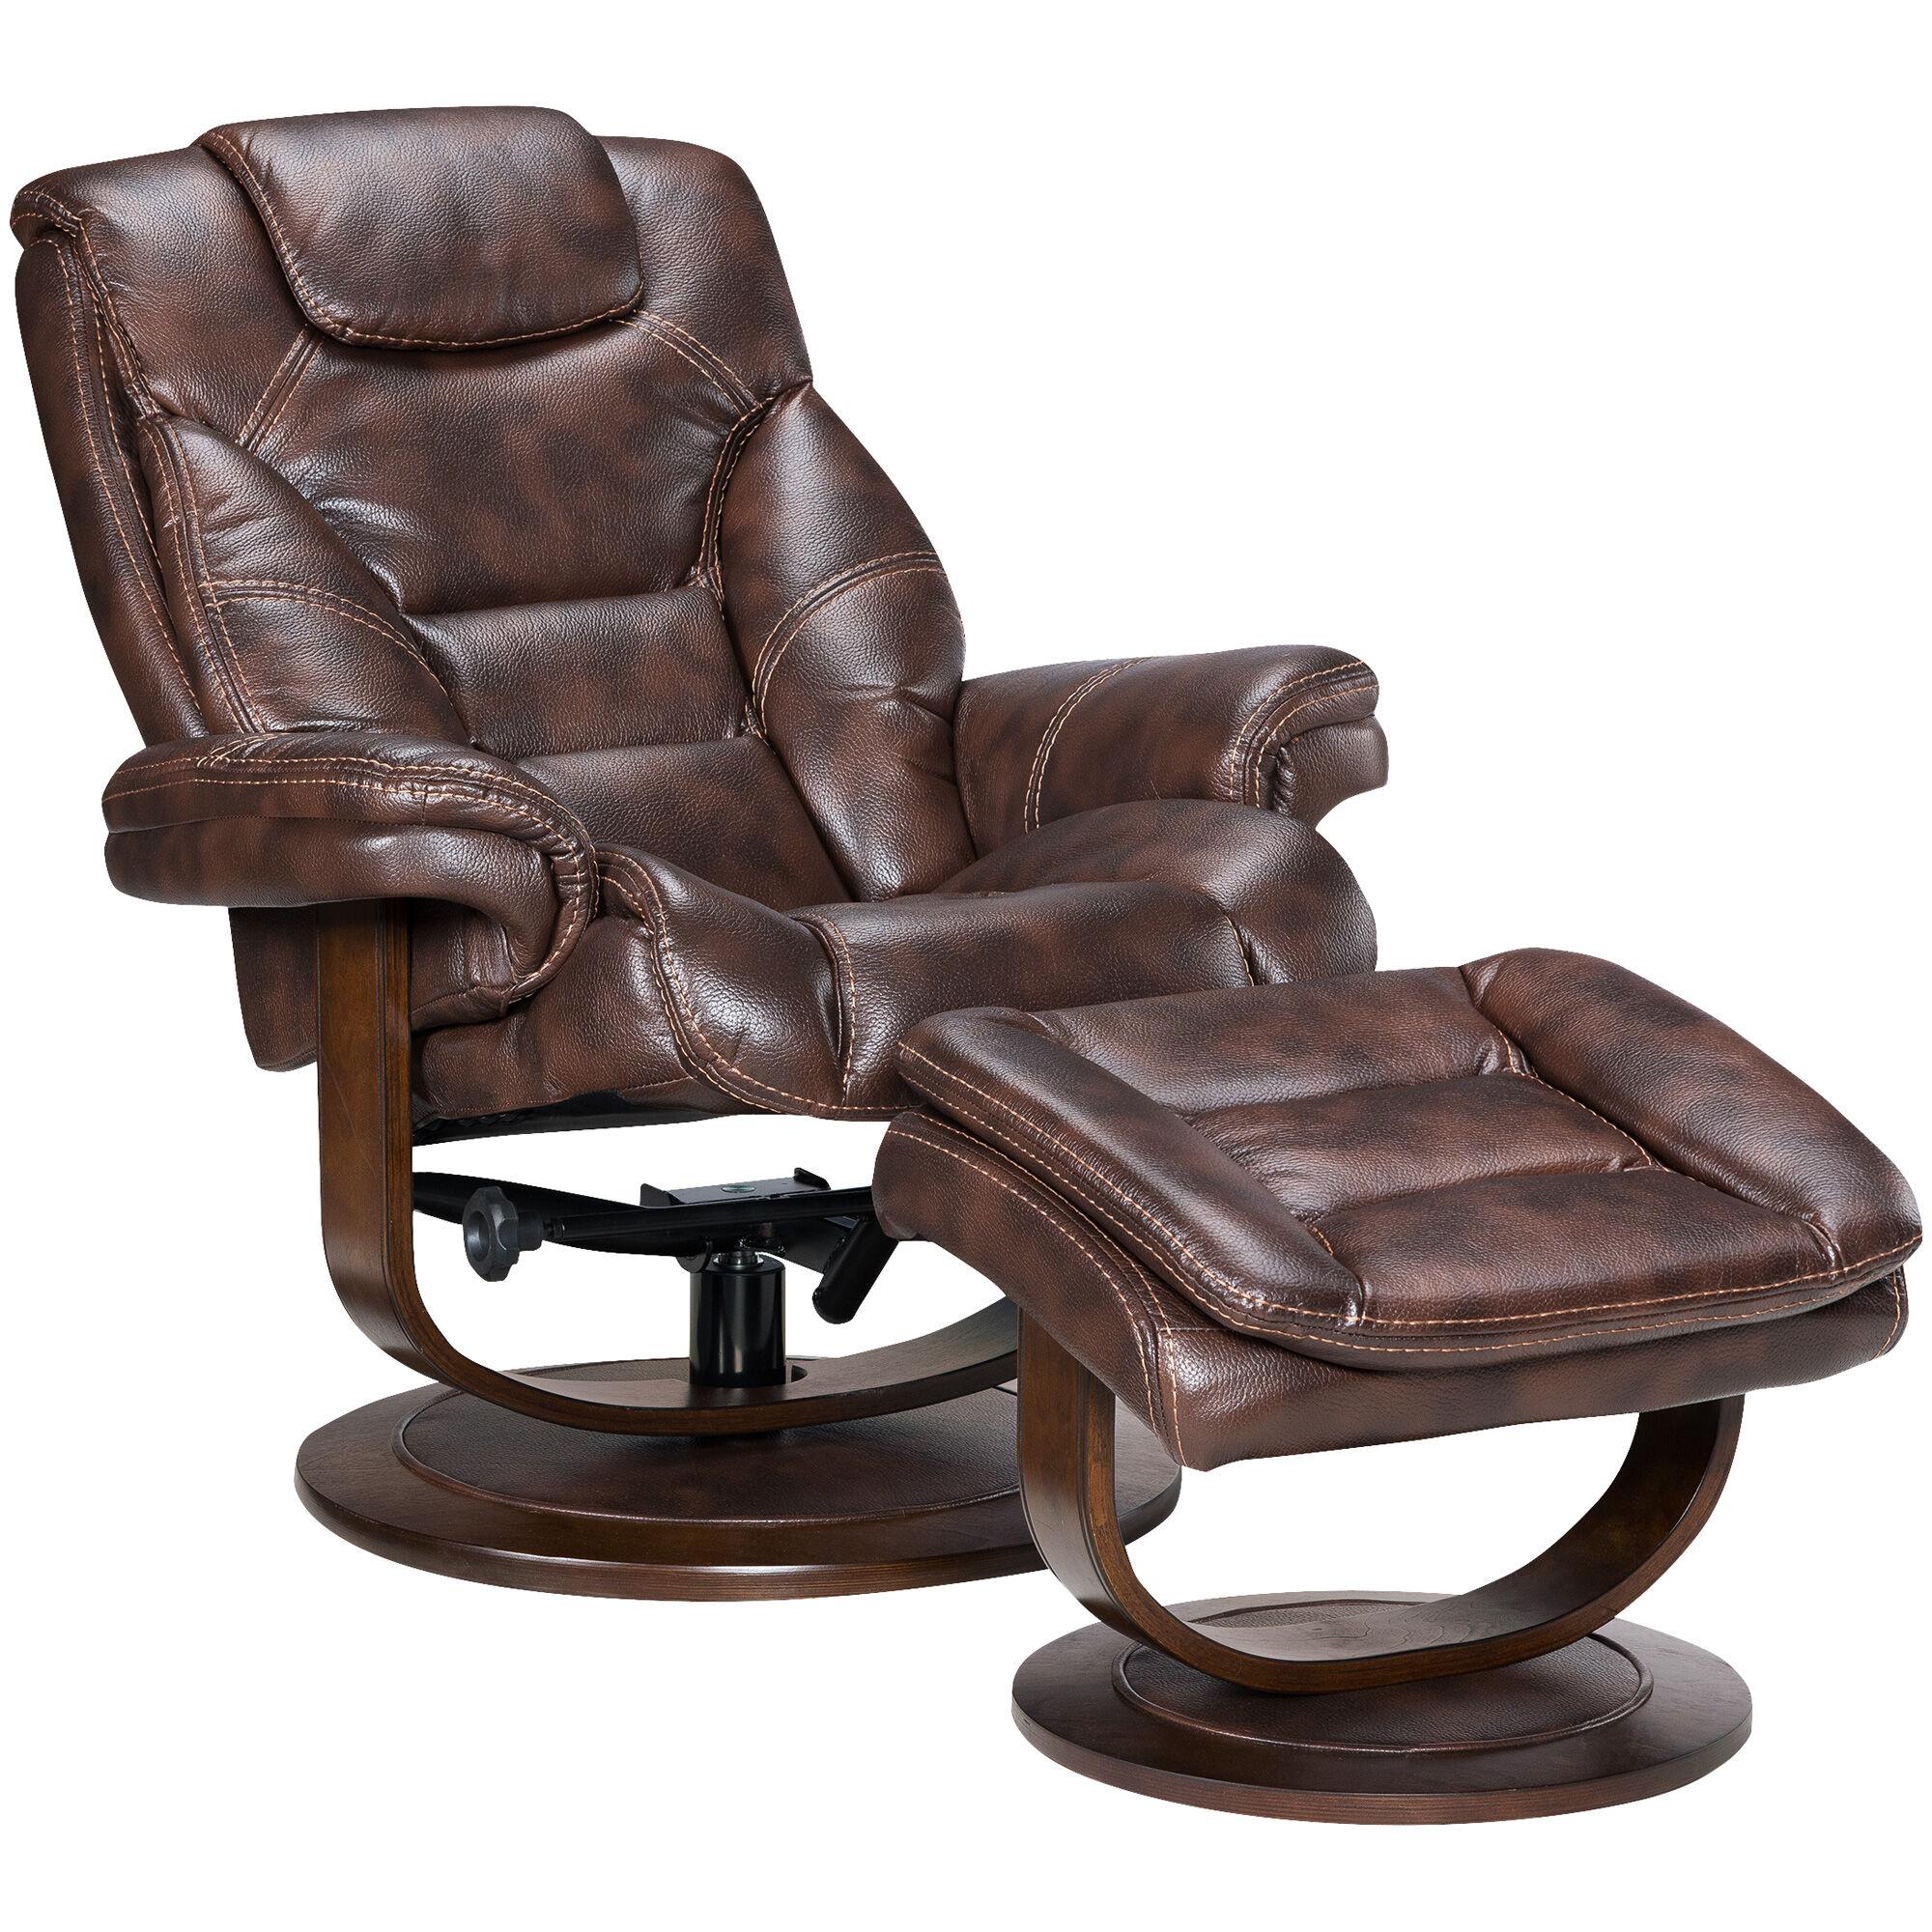 Slumberland Furniture  Apex Swivel Lounger  Ottoman